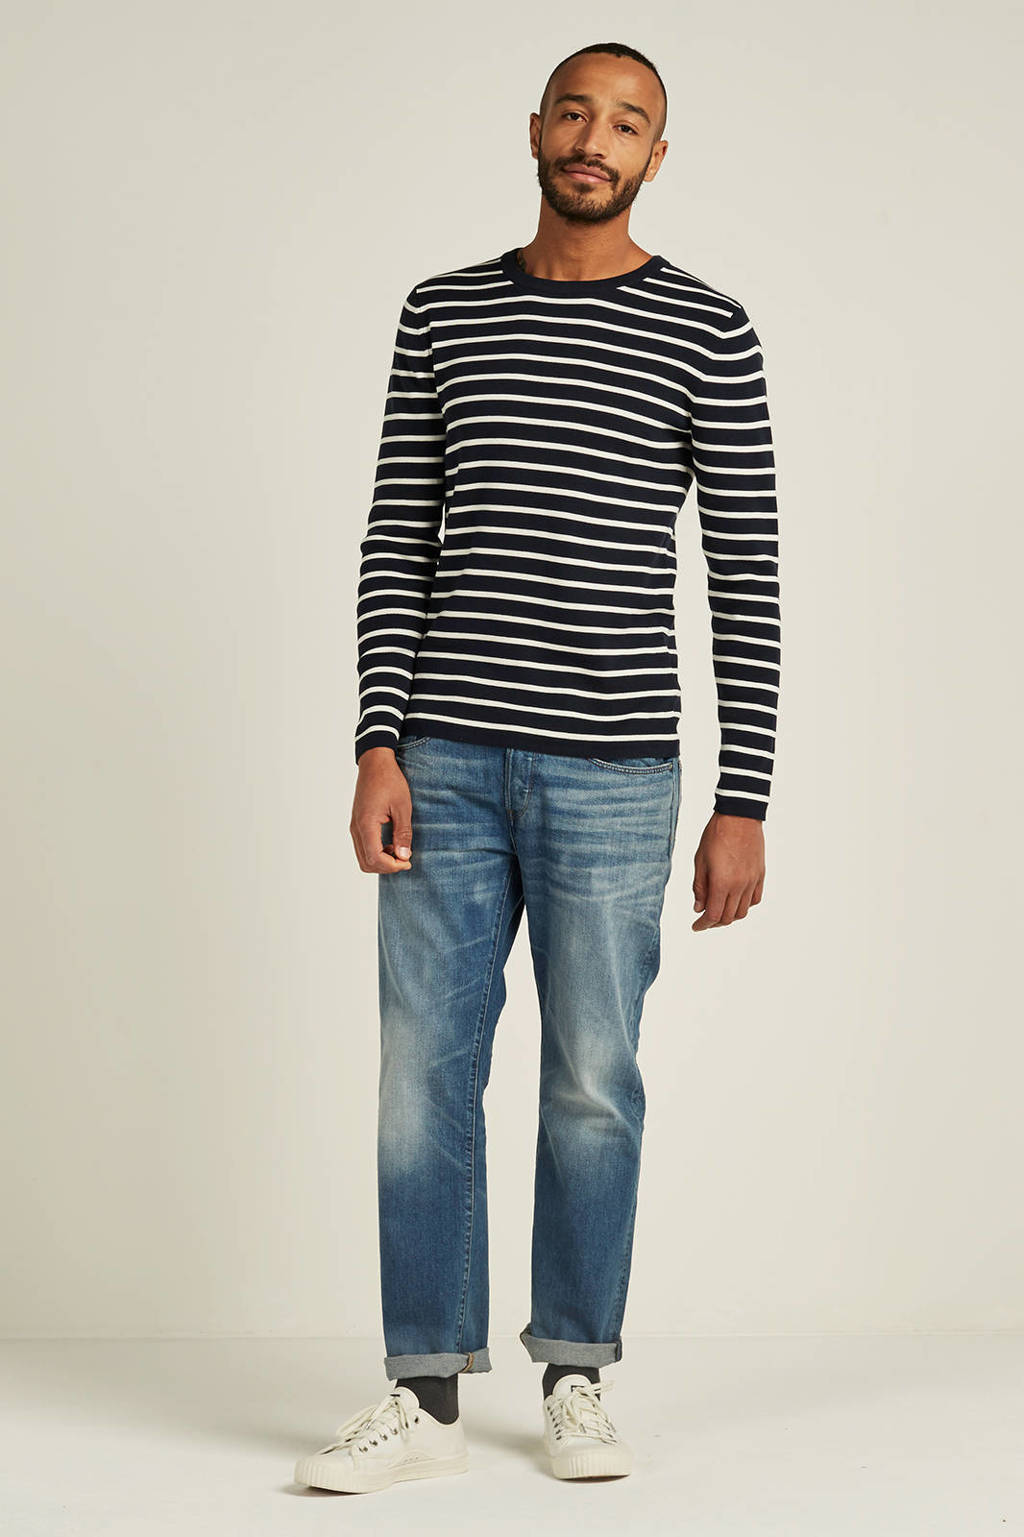 G-Star RAW loose fit jeans 3301, Medium aged